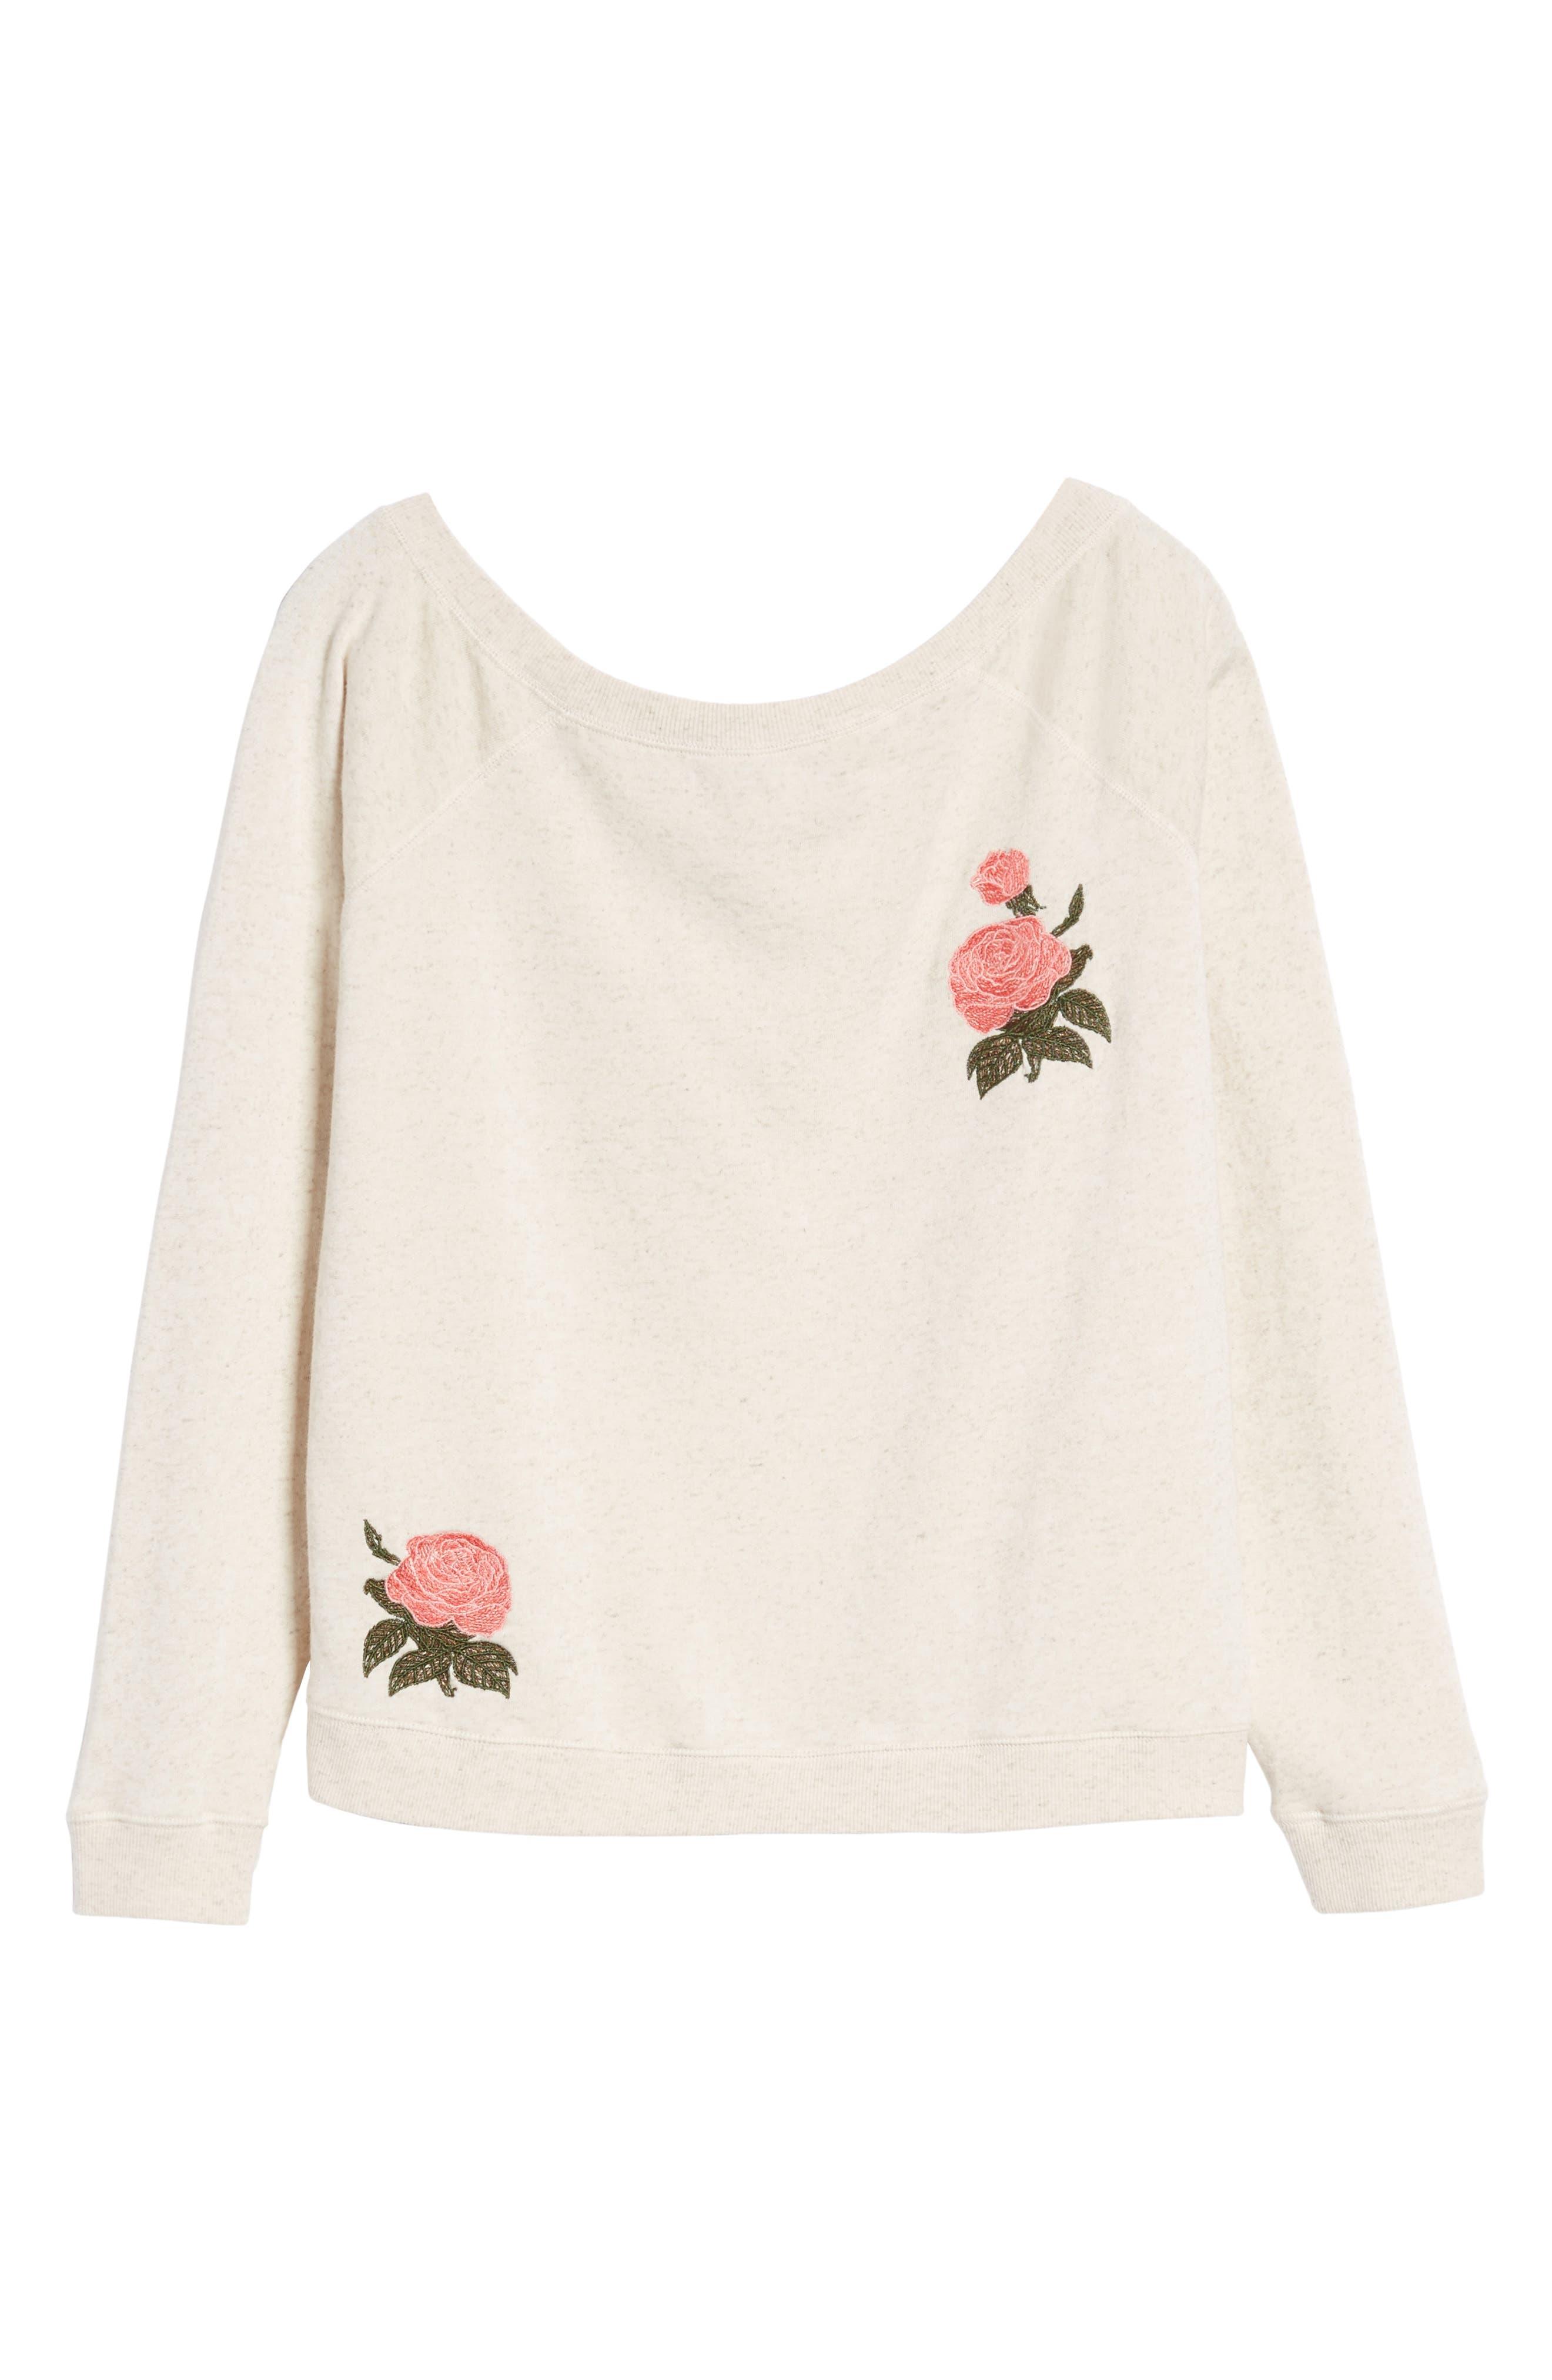 Embroidered Rose Sweatshirt,                             Alternate thumbnail 6, color,                             Natural Multi